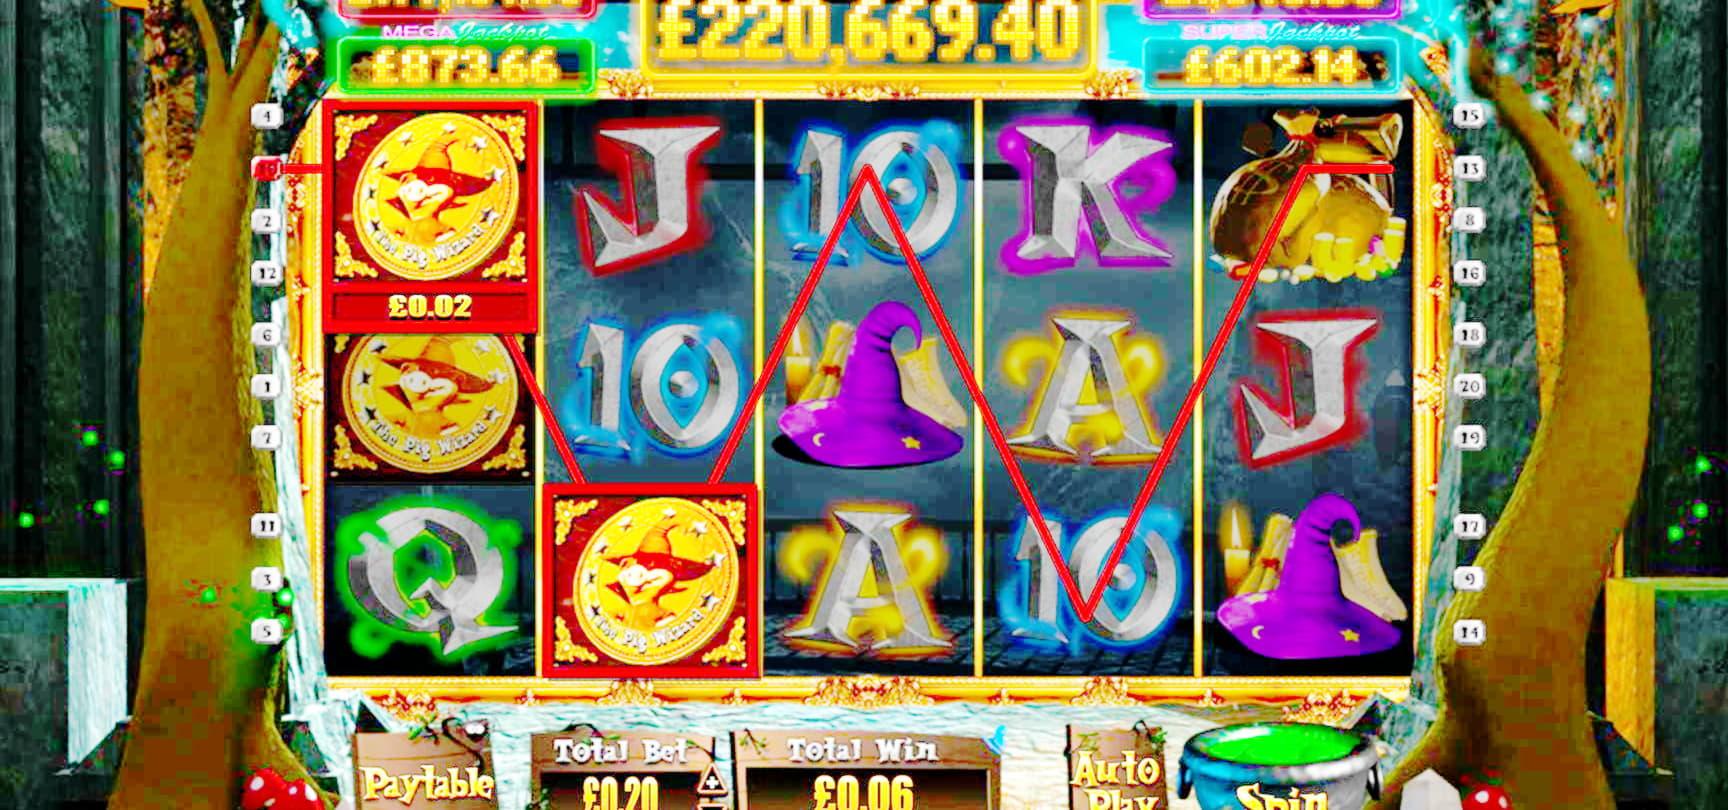 €655 FREE CHIP at BGO Casino